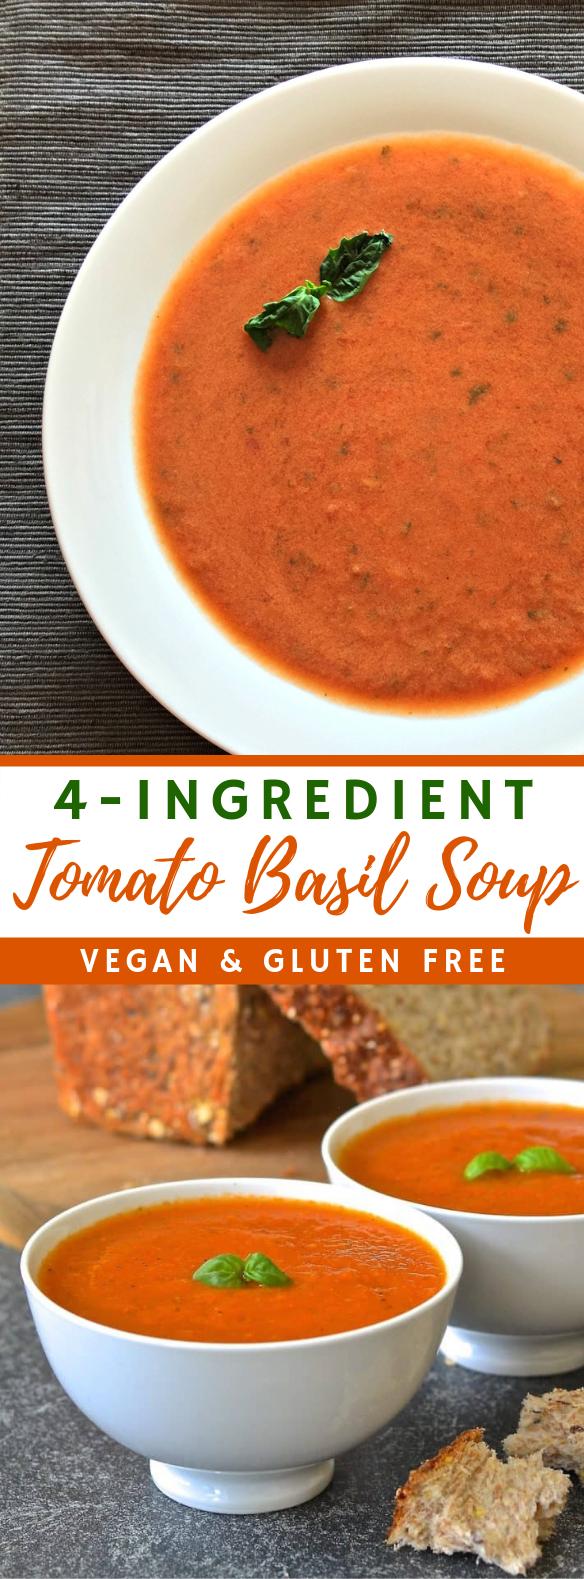 Easy Tomato Basil Soup #vegetarian #simplerecipe